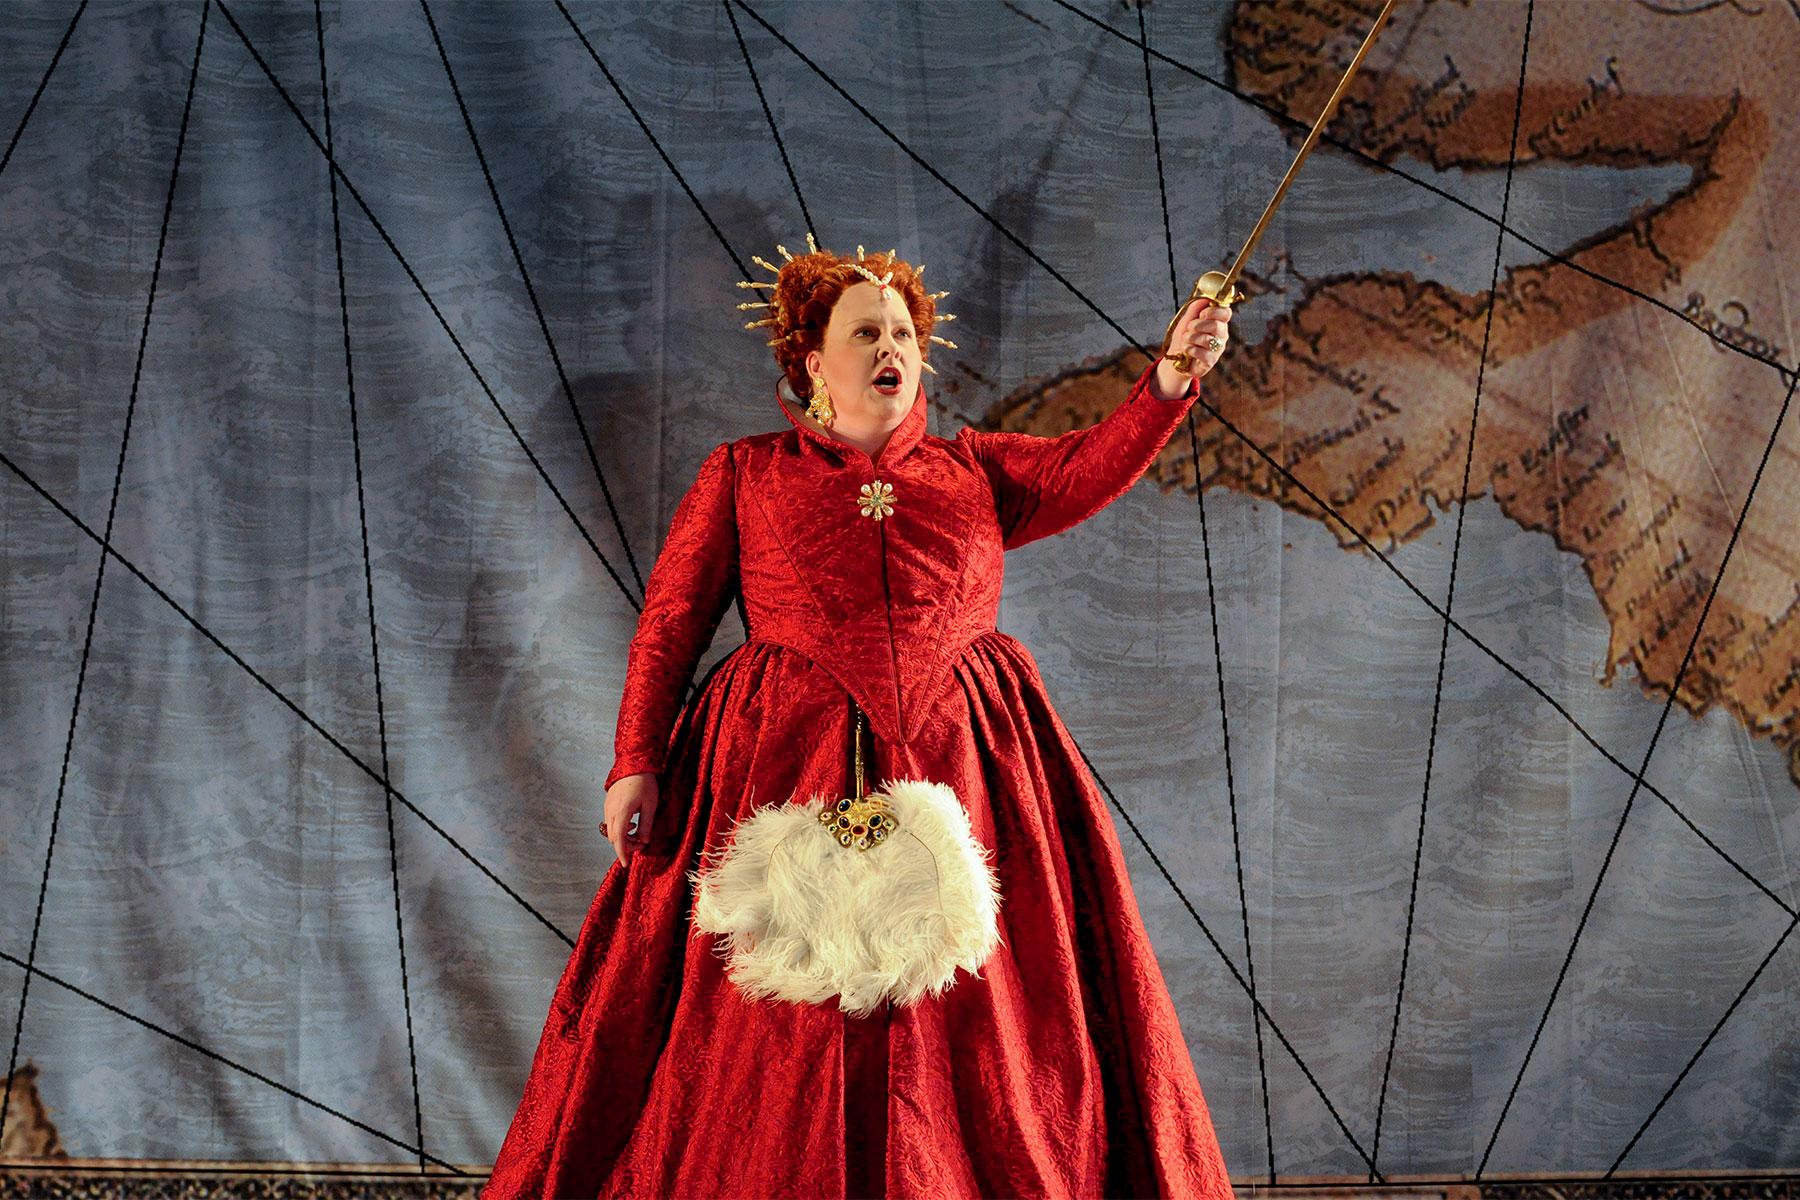 Angela Meade in costume